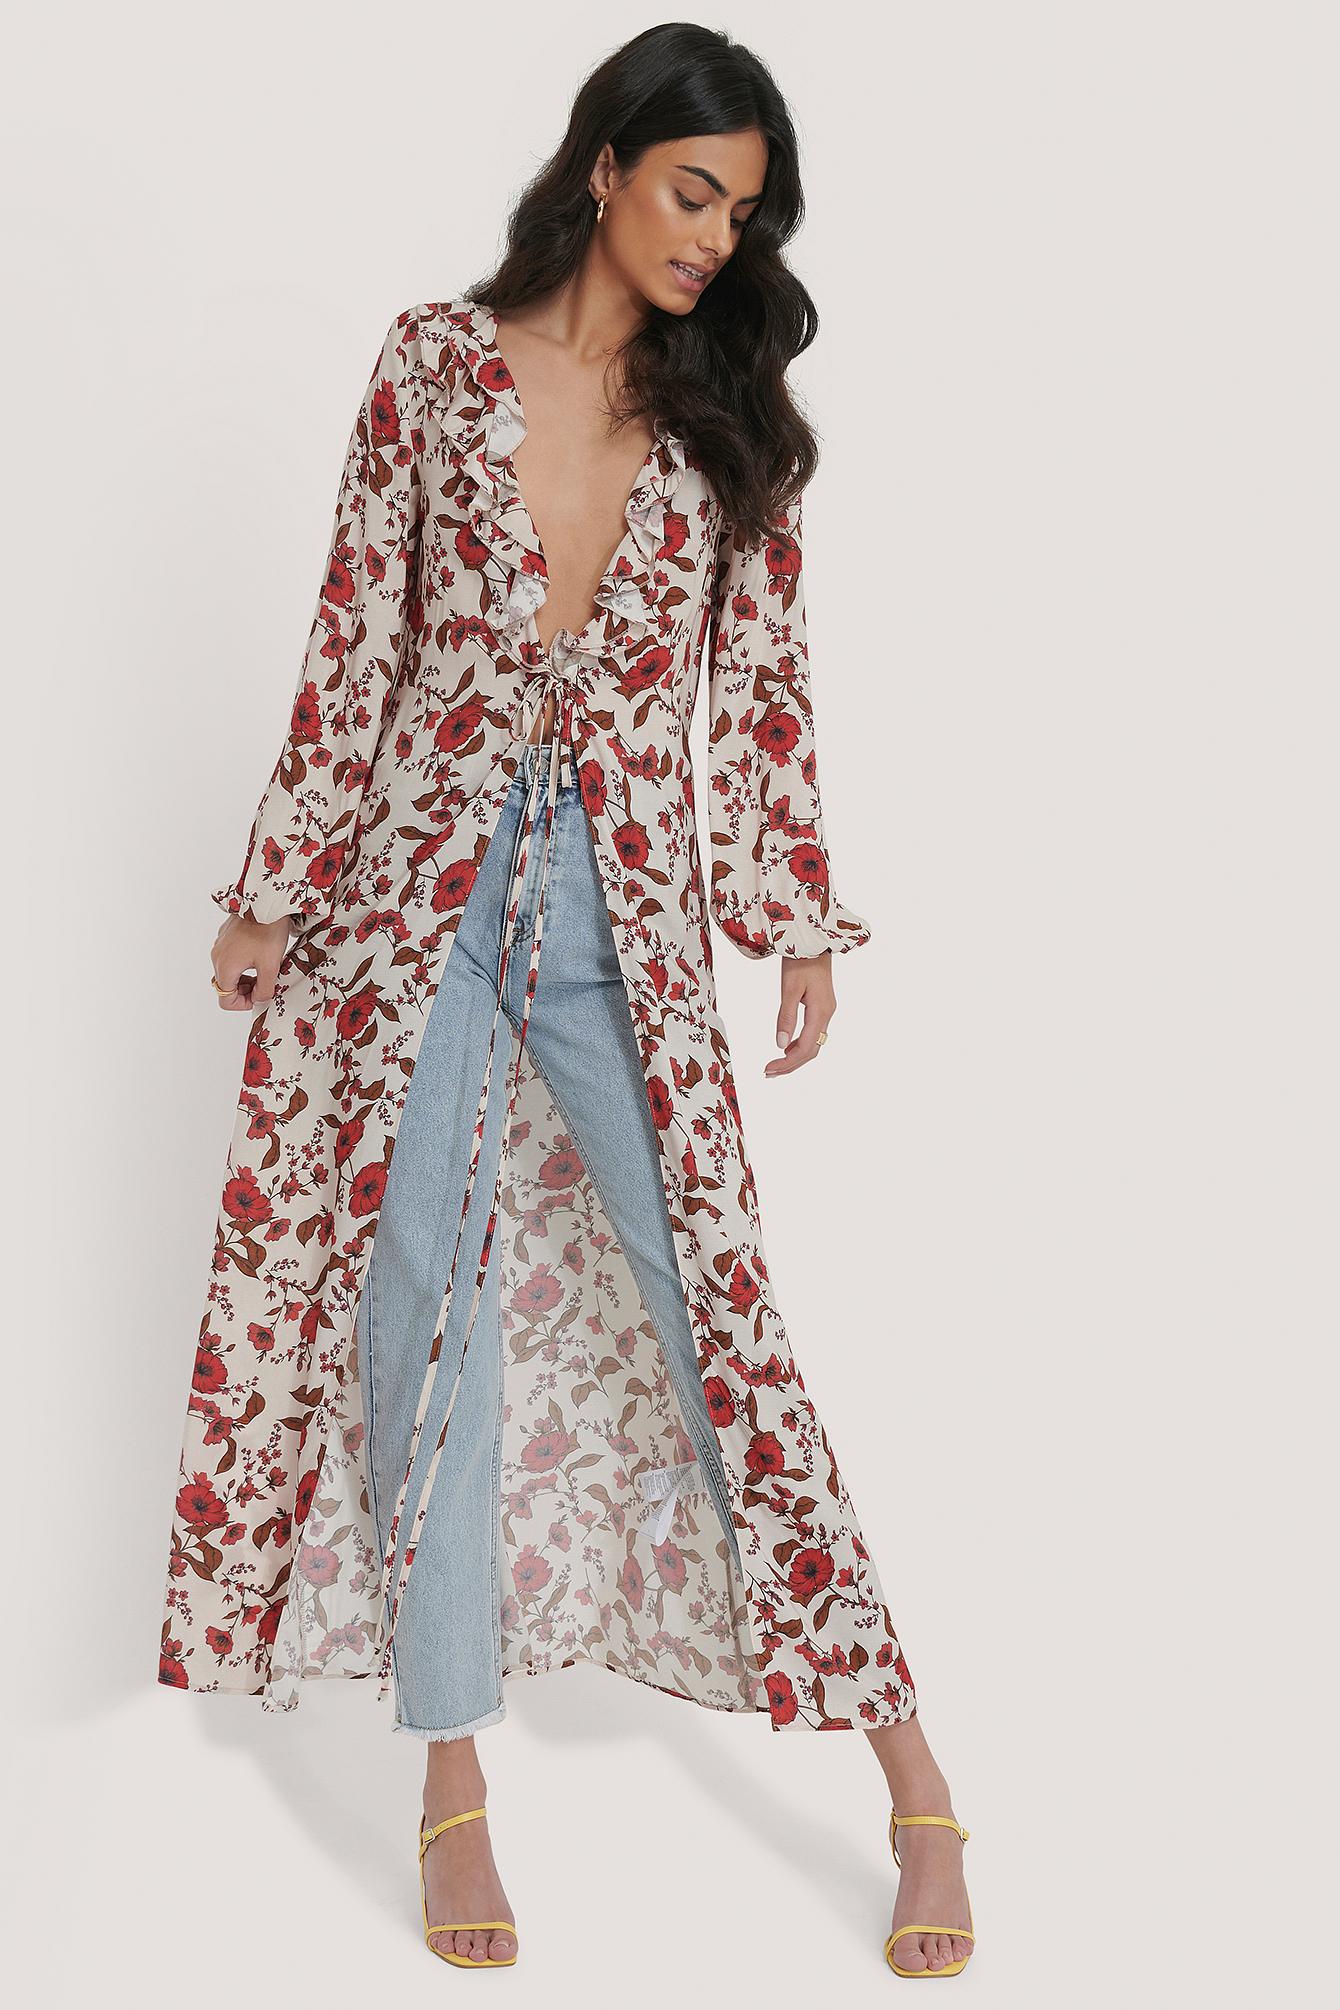 Trendyol Kimono - Multicolor   Bekleidung > Homewear > Kimonos   Trendyol